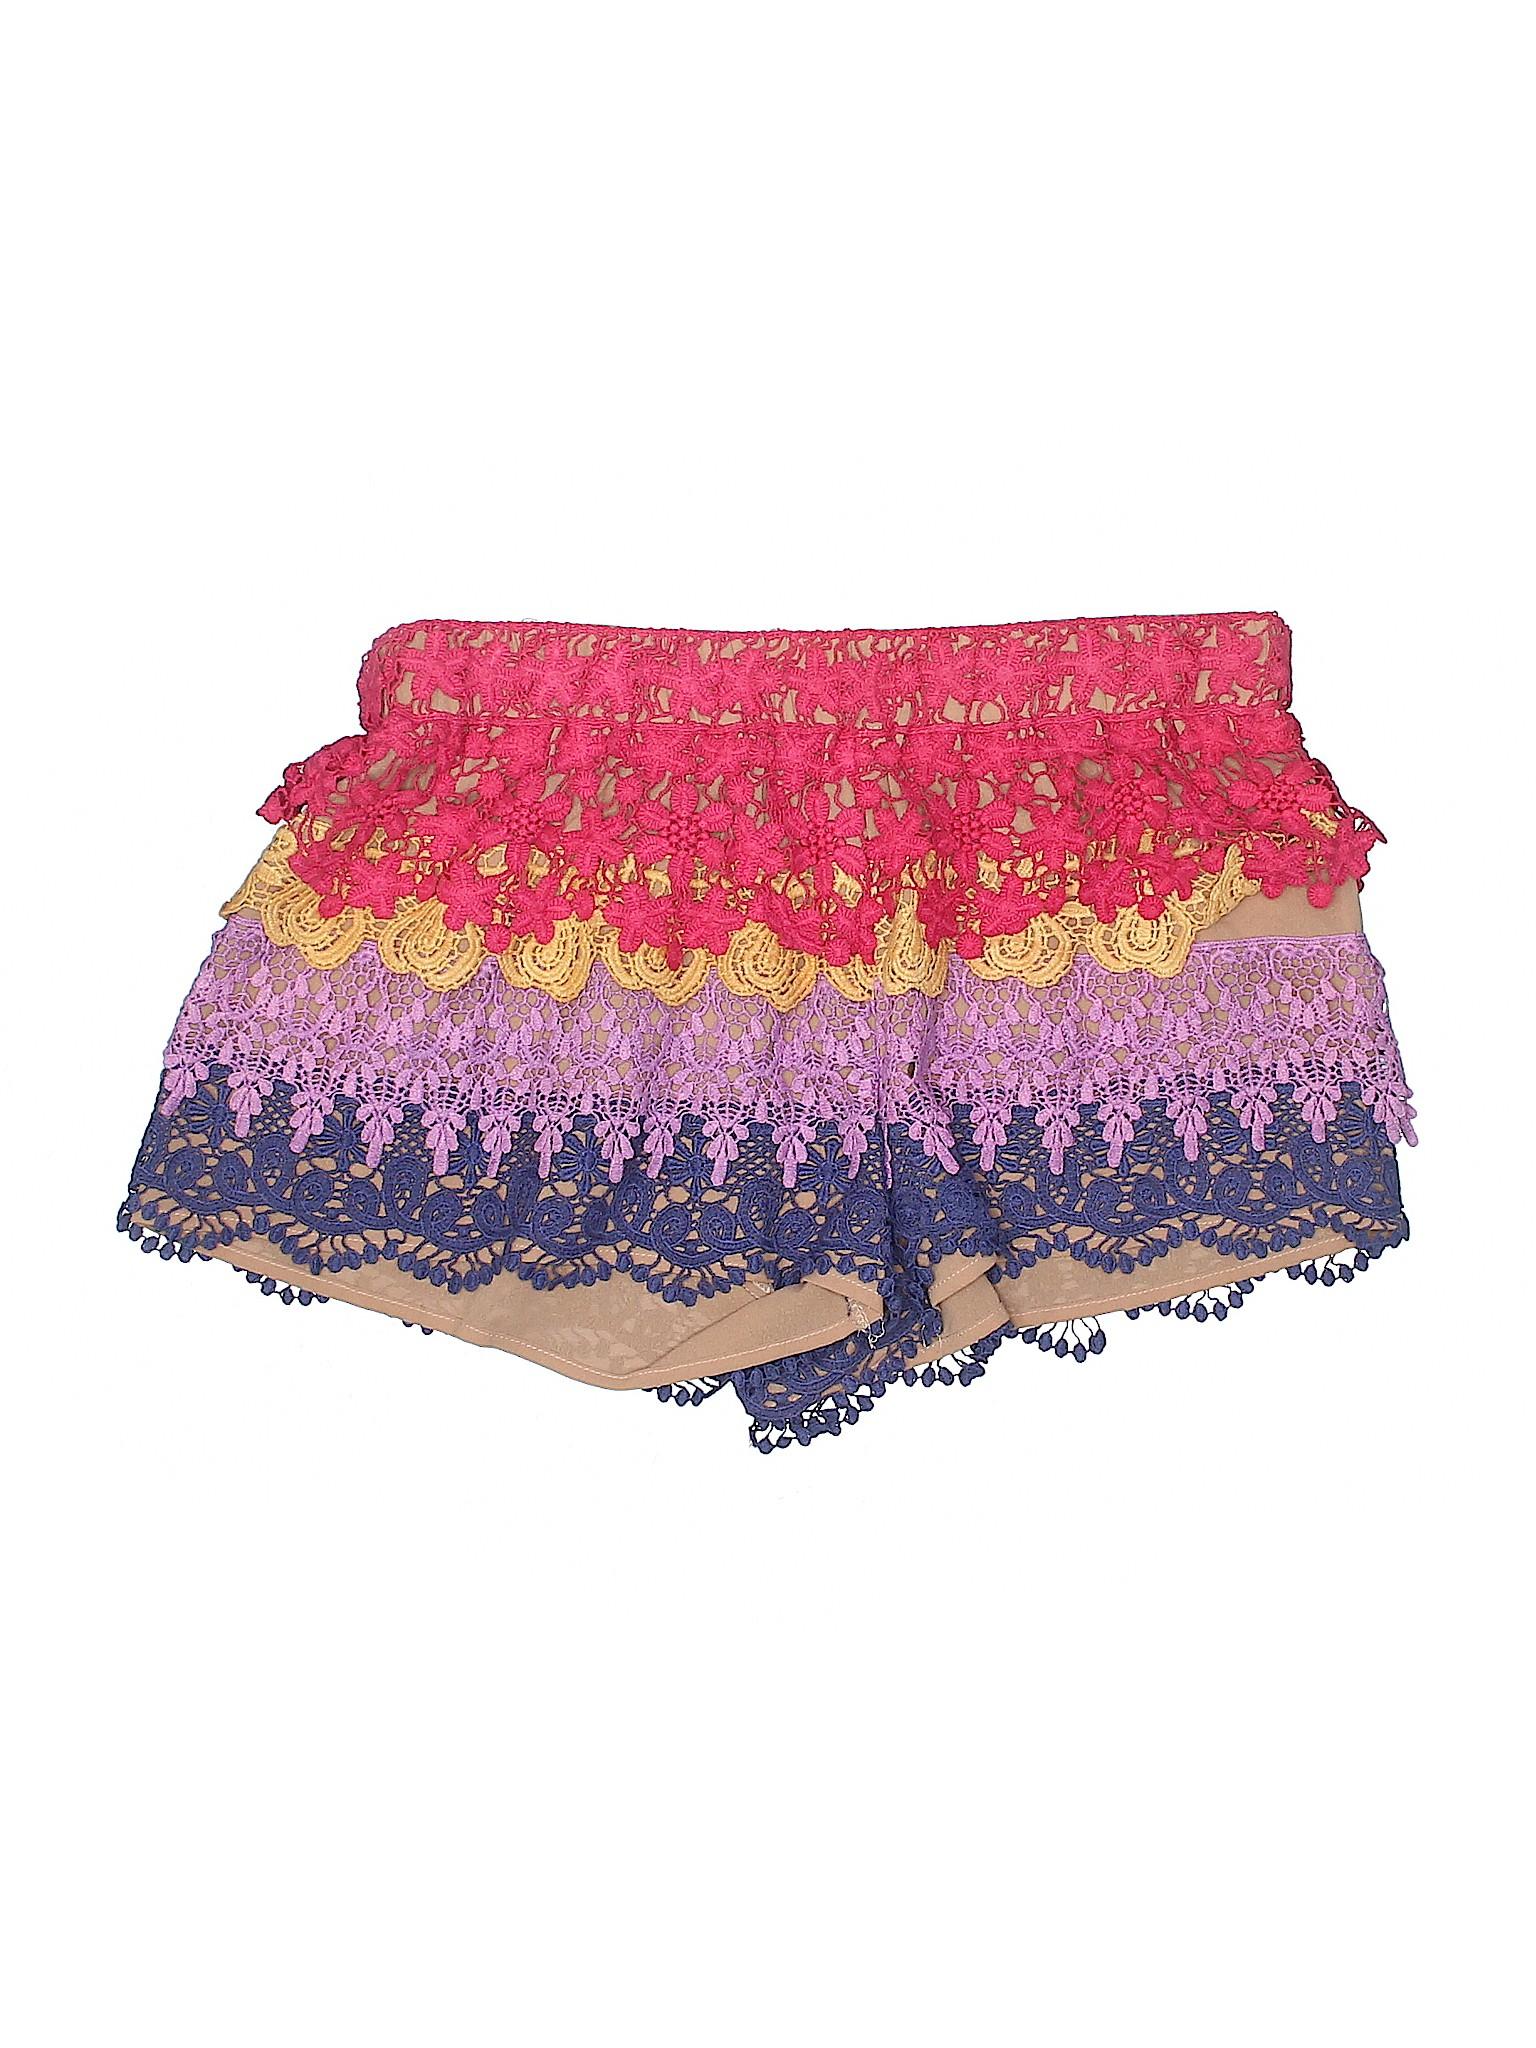 Boutique Shorts Dressy Dressy Shorts Dressy Shorts Umgee Boutique Boutique Umgee Umgee vq40A4